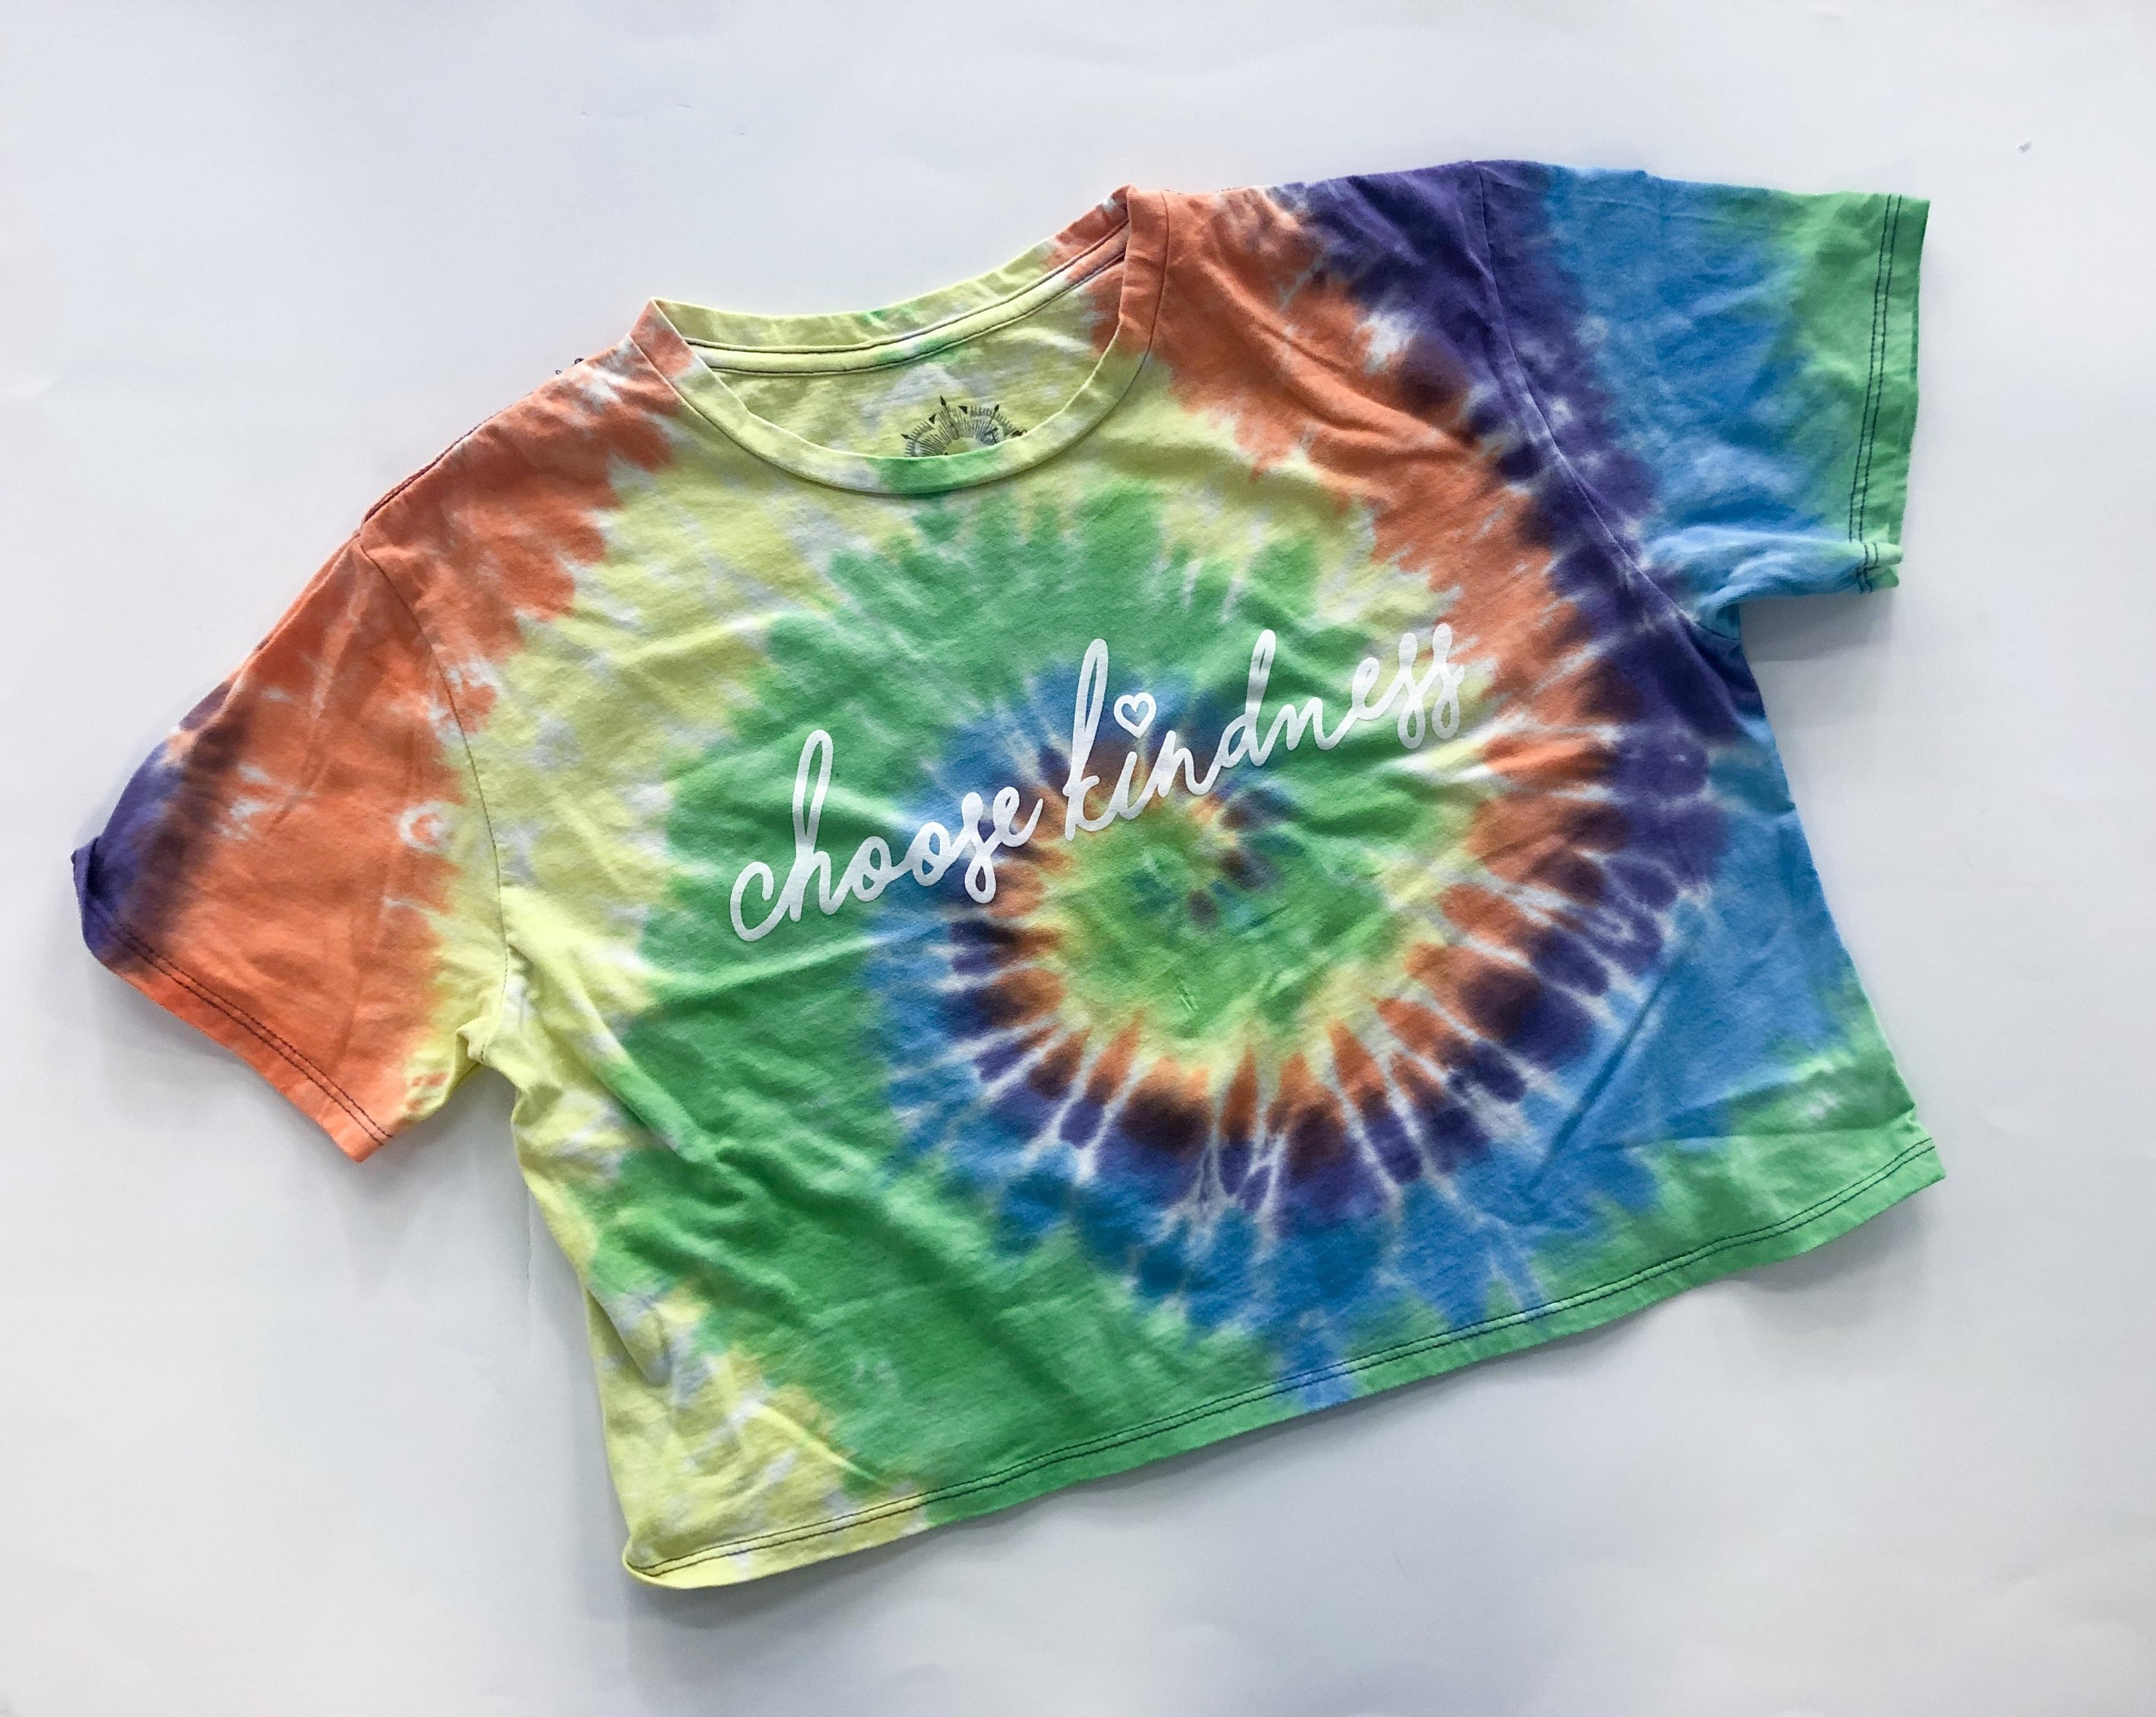 Tie Dye Crop Primary - Choose Kindness 00029